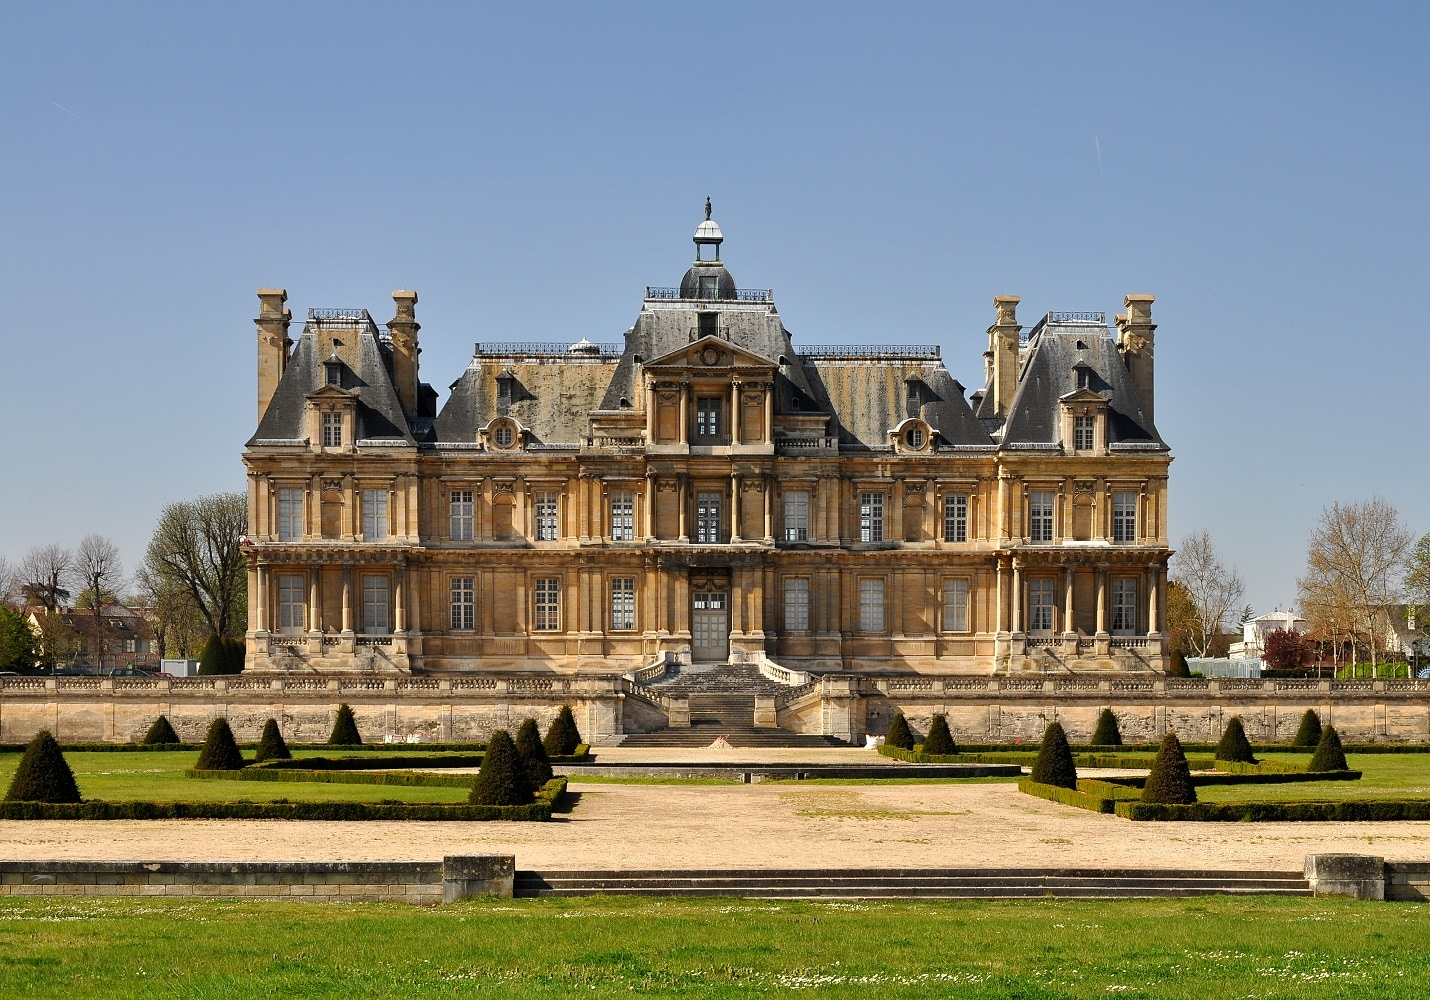 Château de Maisons (1630-51) | Source: wikipedia.org